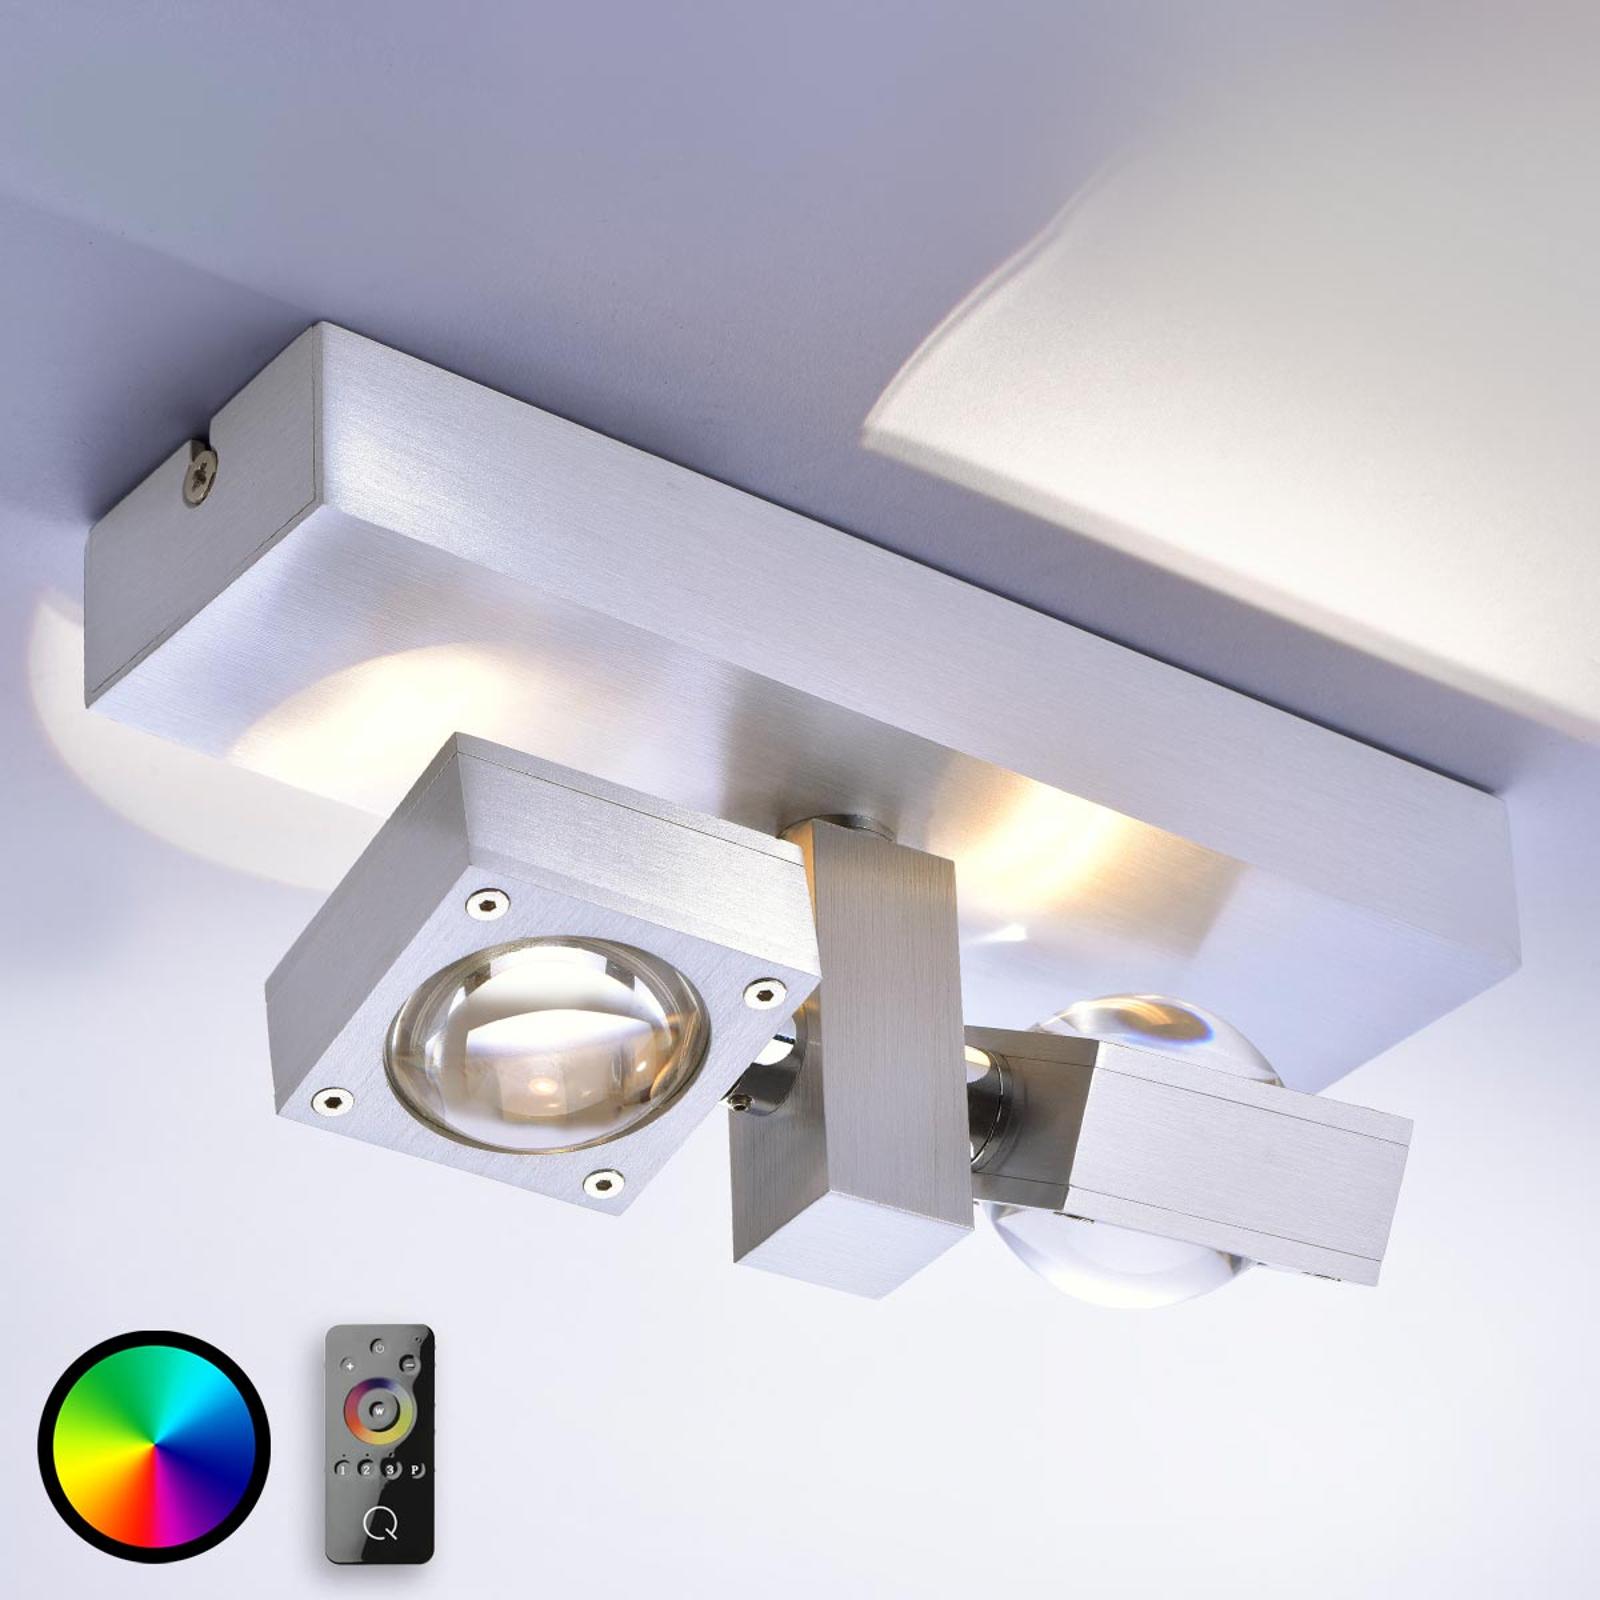 Q-Nemo – sterowana lampa sufitowa LED z pilotem